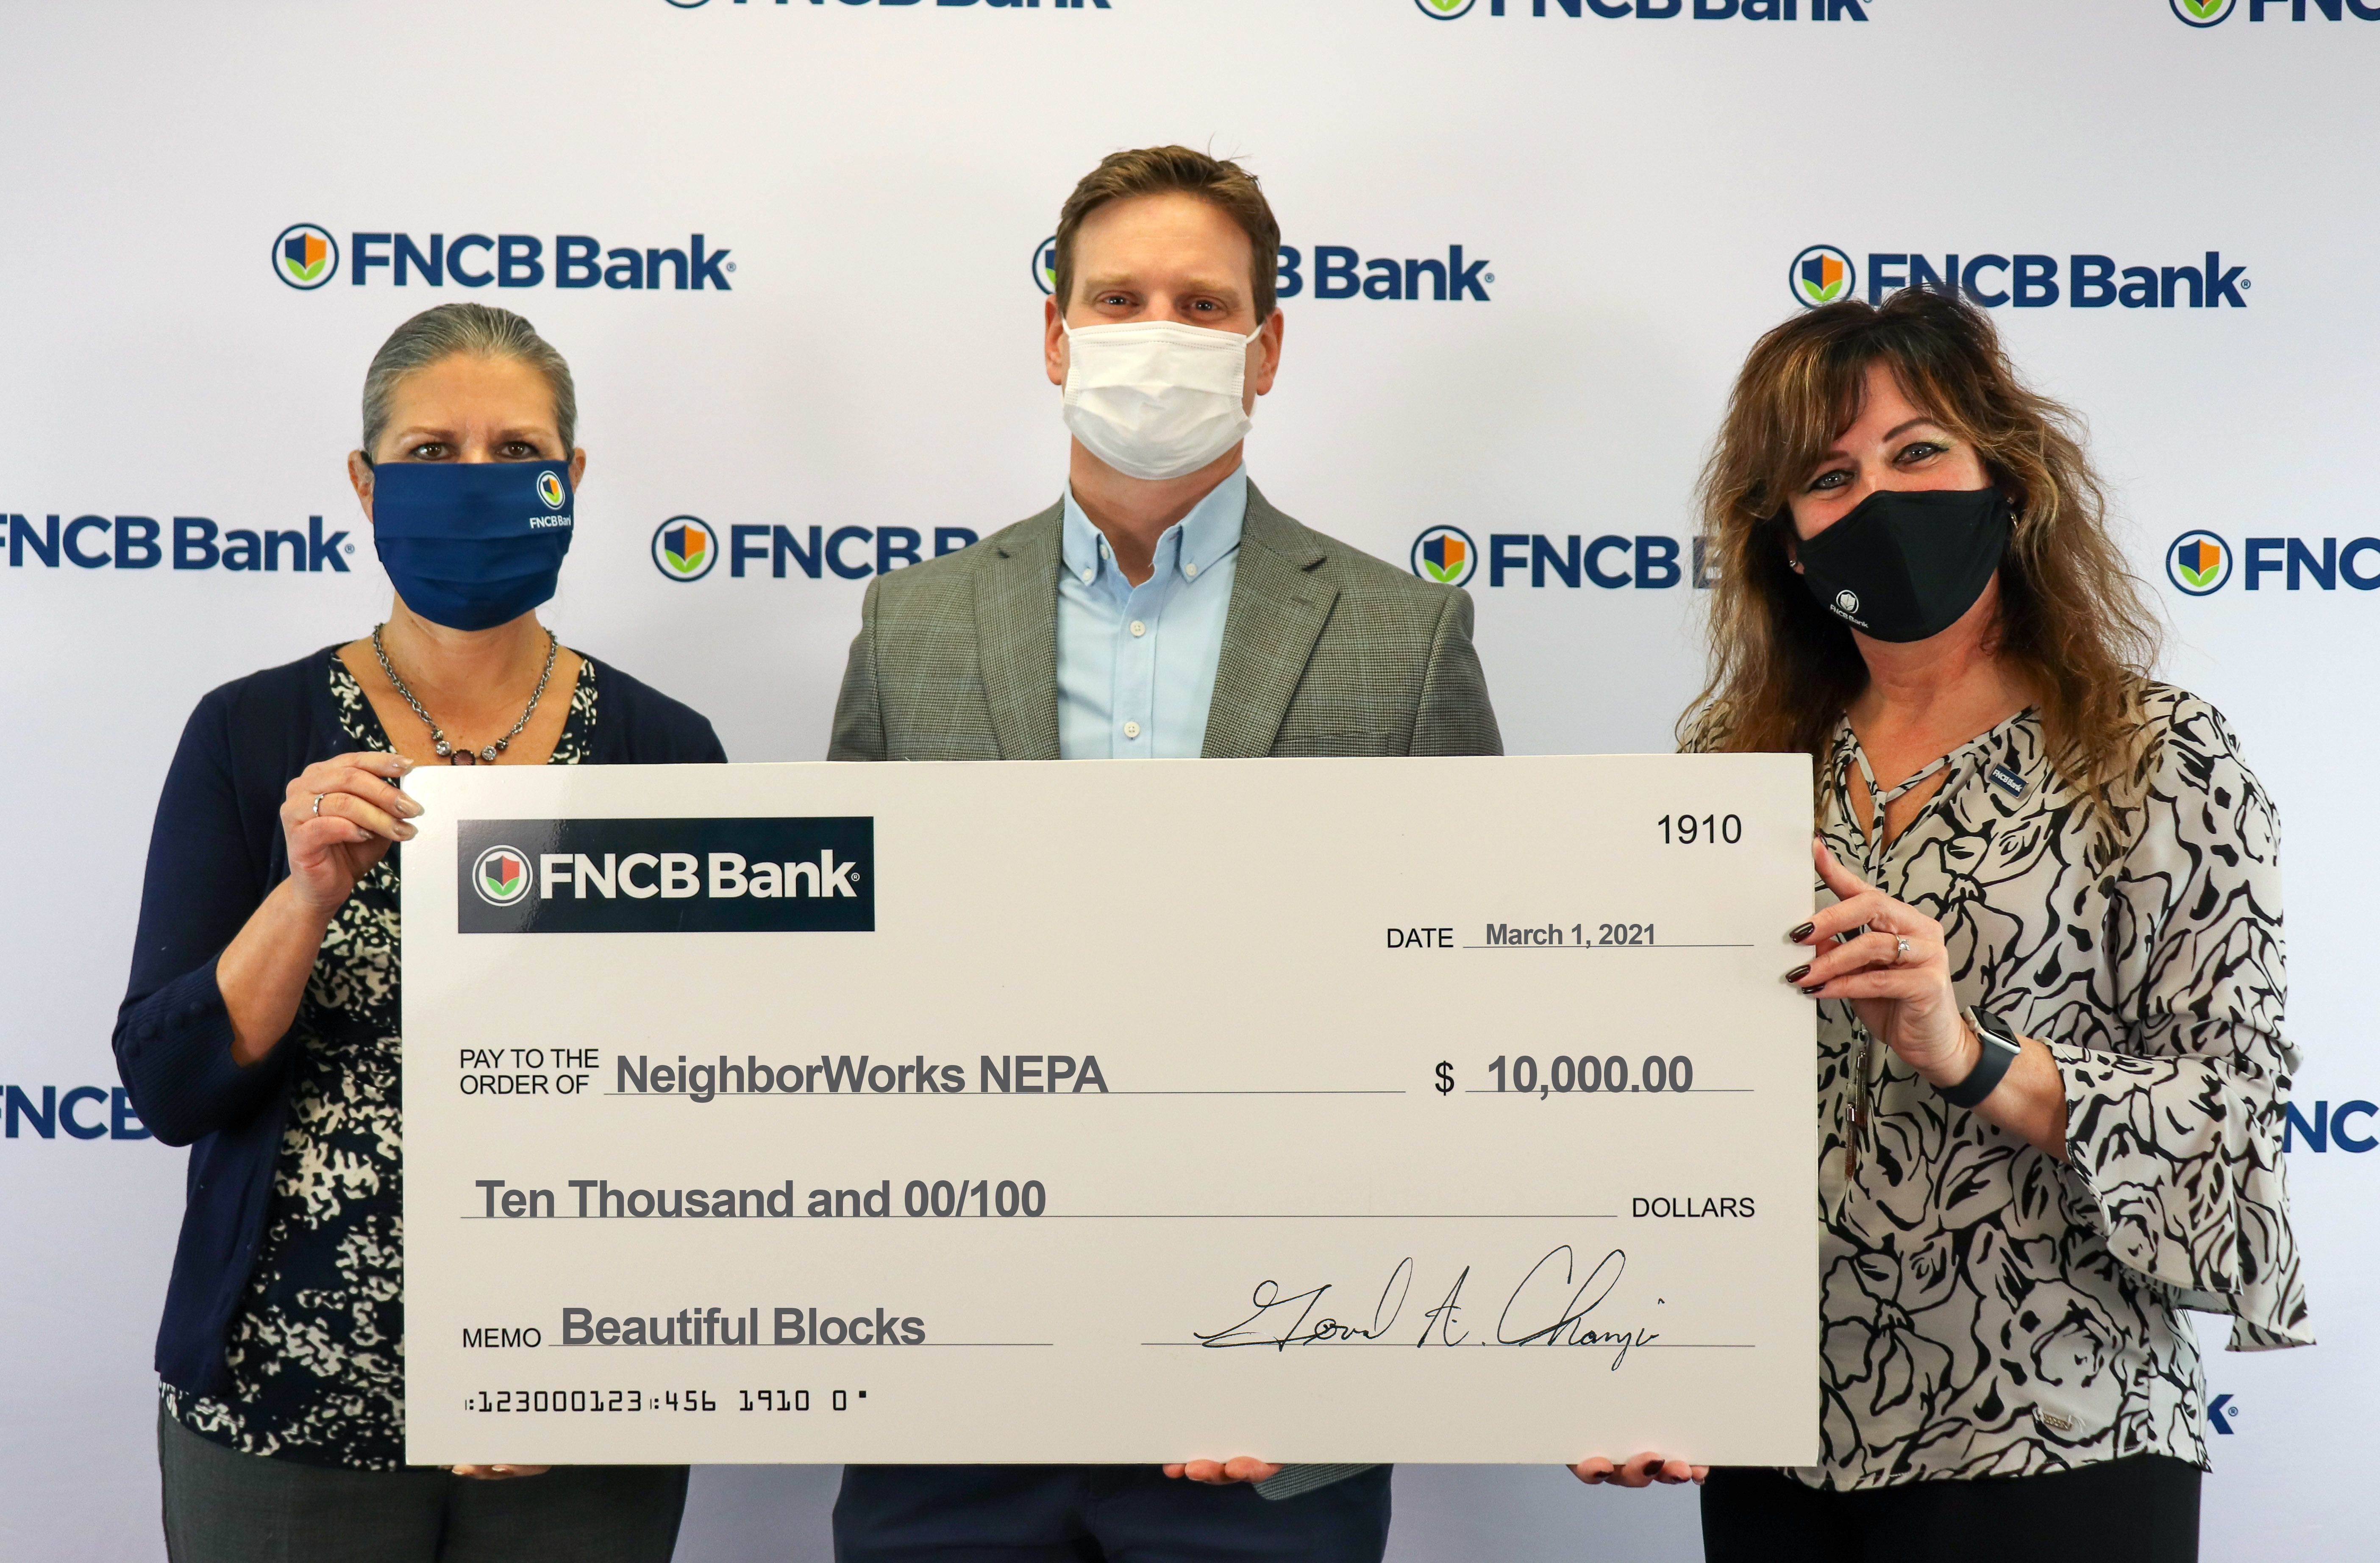 FNCB Bank Donates to Beautiful Blocks Program